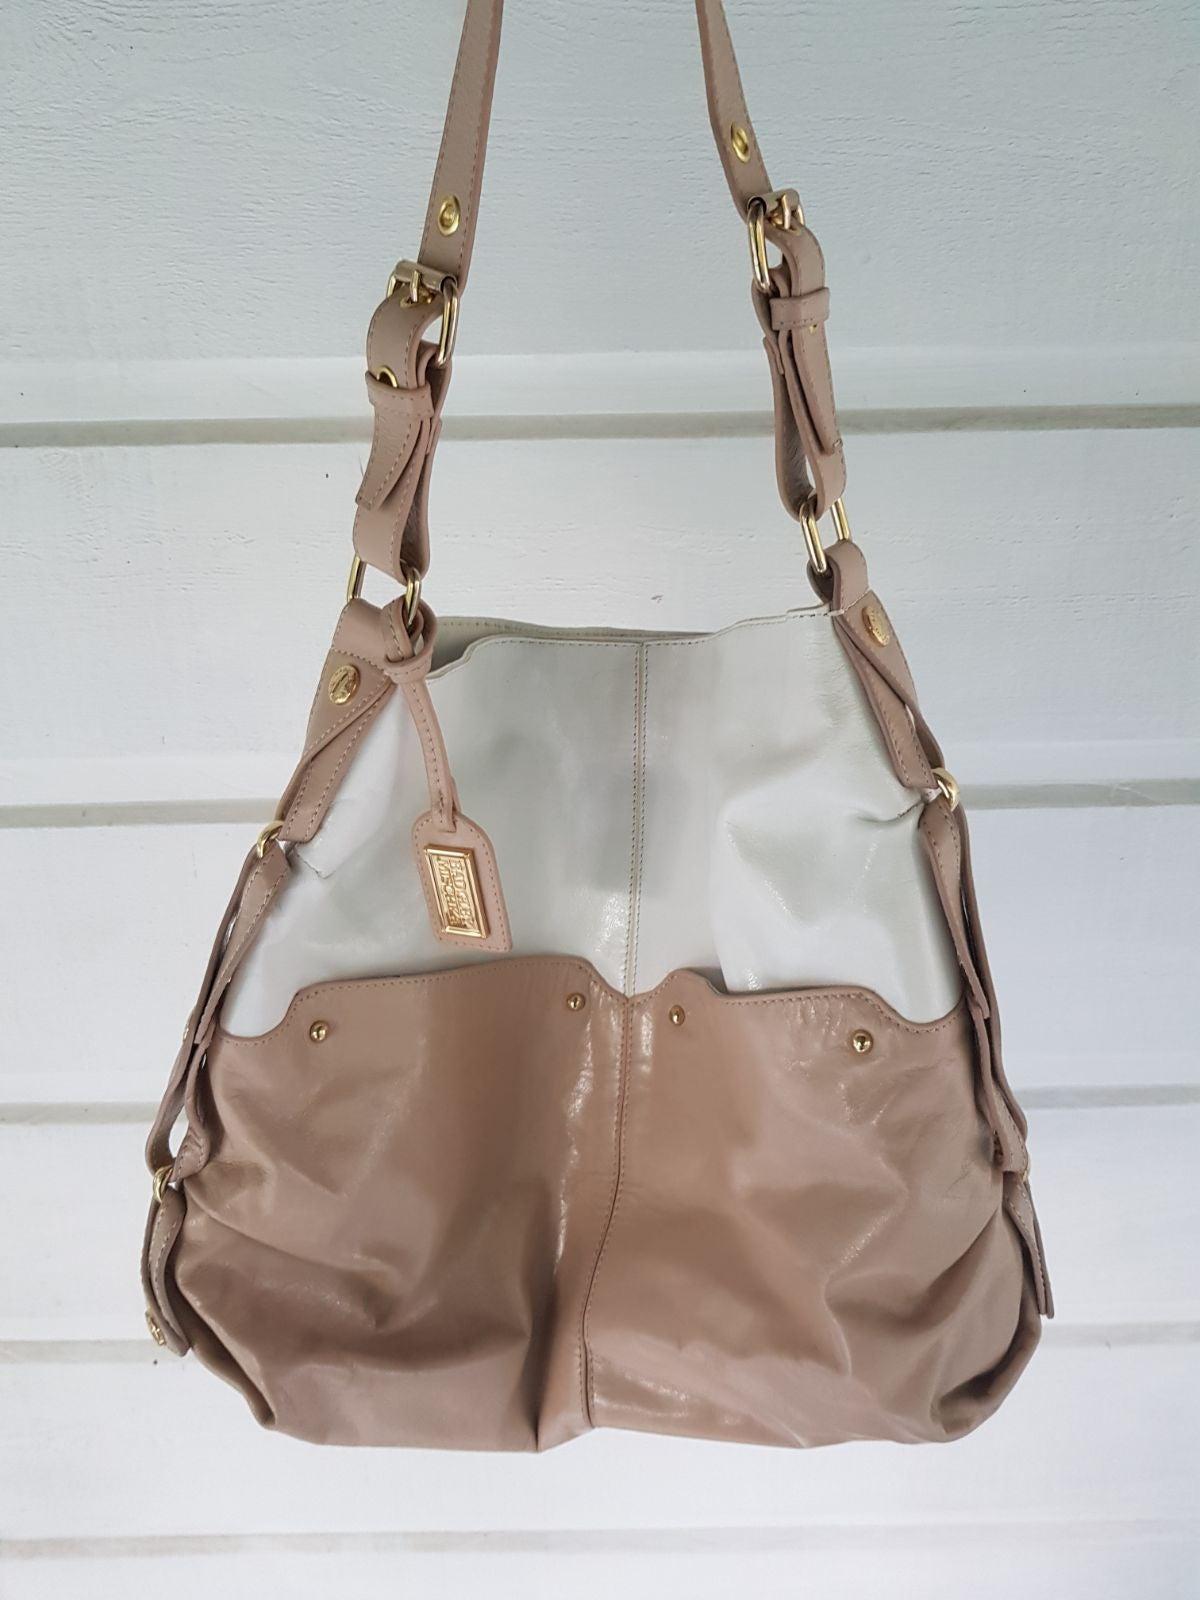 Badgley Mischka leather hobo Bag excelle